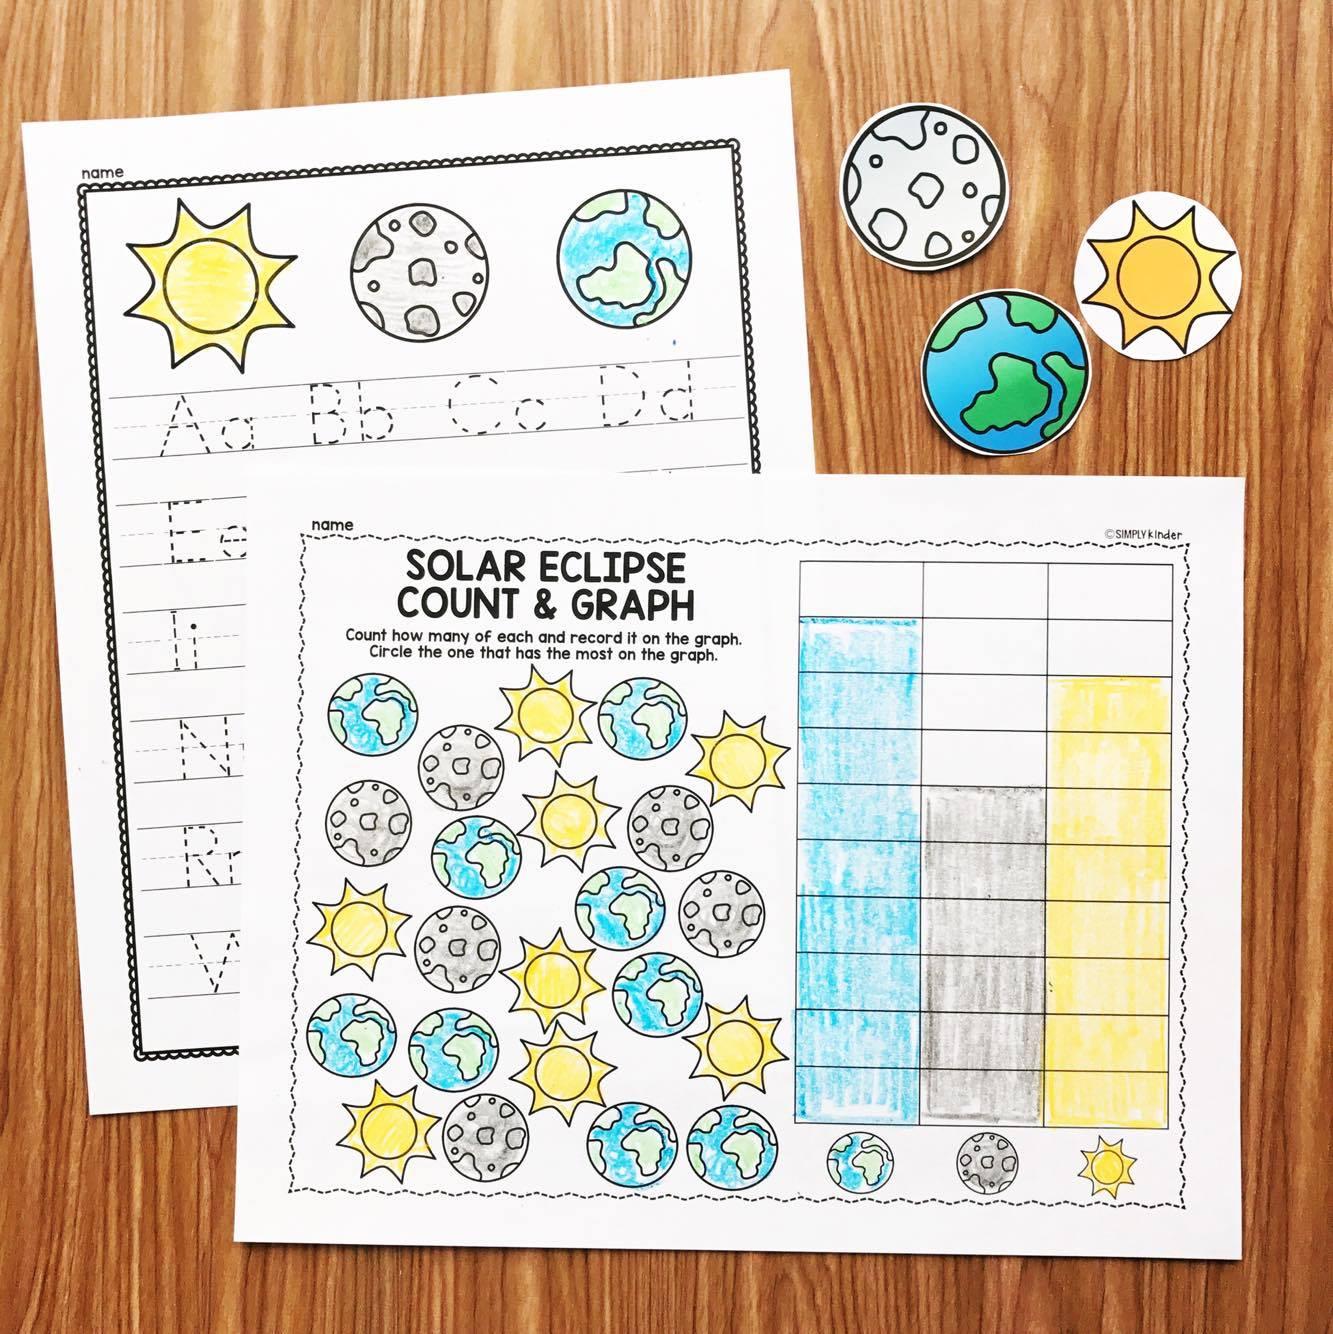 Eclipse activities for preschool, kindergarten, and first grade from Simply Kinder!